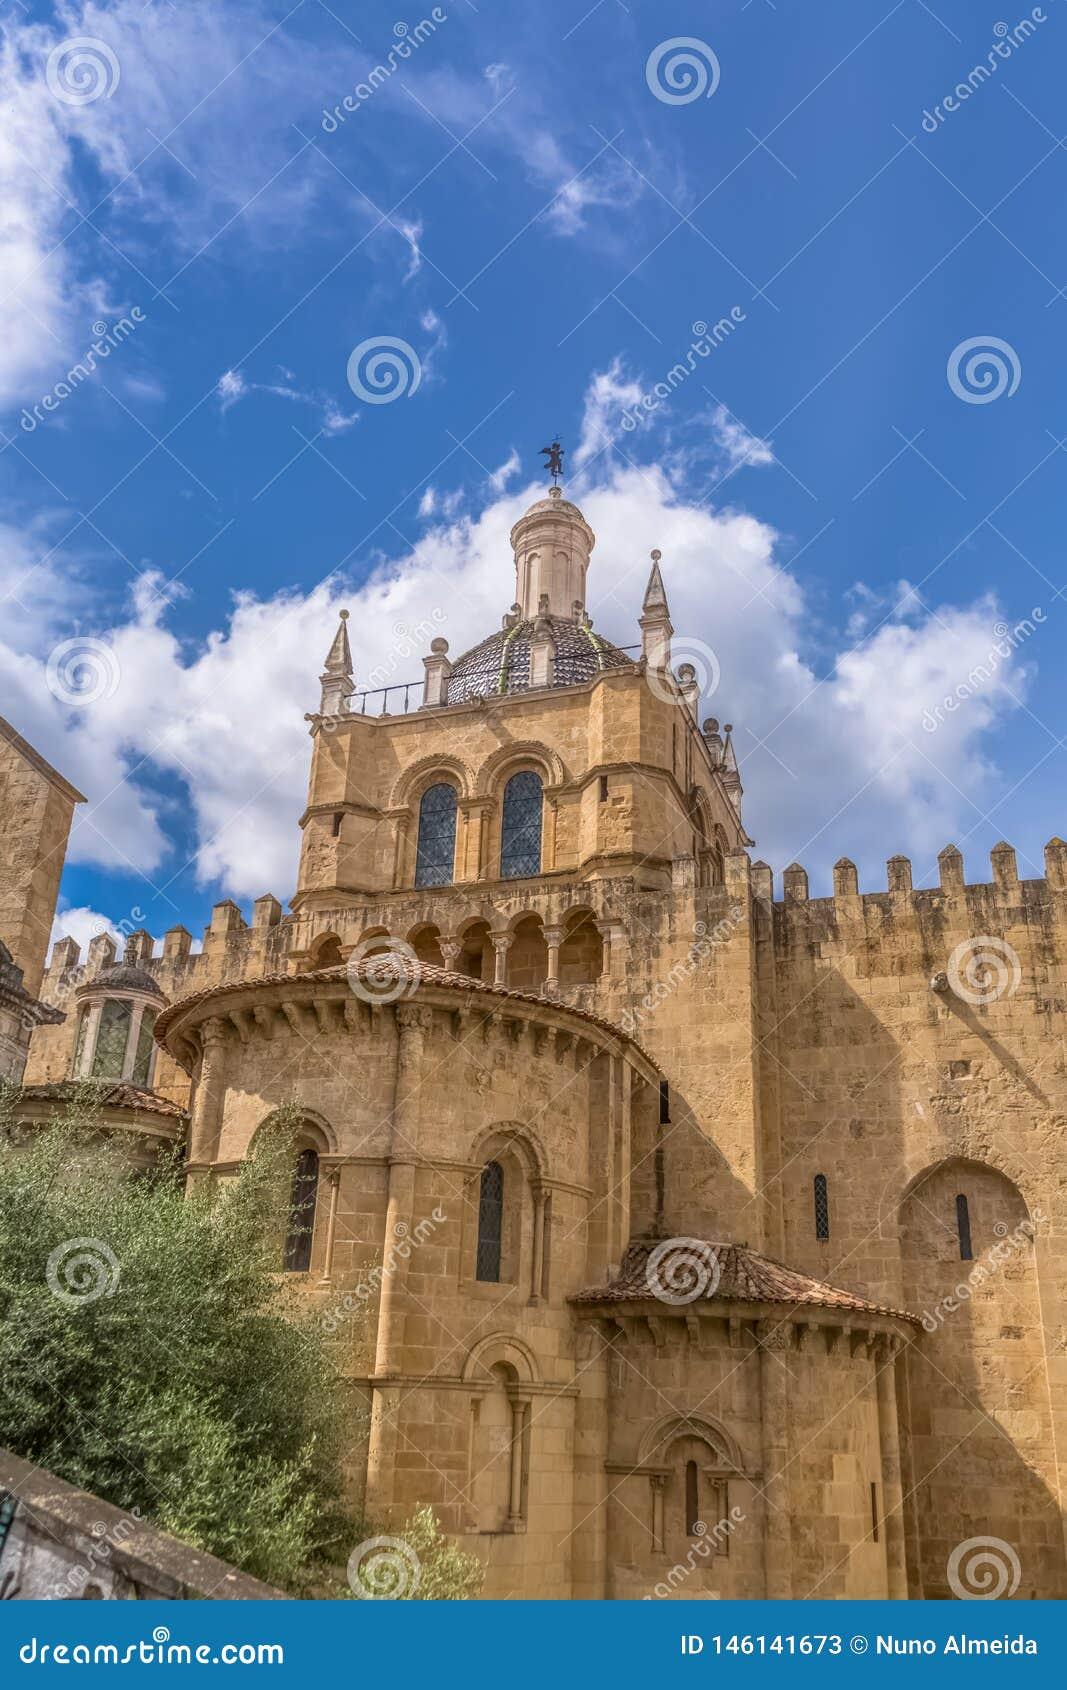 Коимбра/Португалия - 04 04 2019: Взгляд бокового фасада готического здания города собора Коимбры, Коимбры и неба как